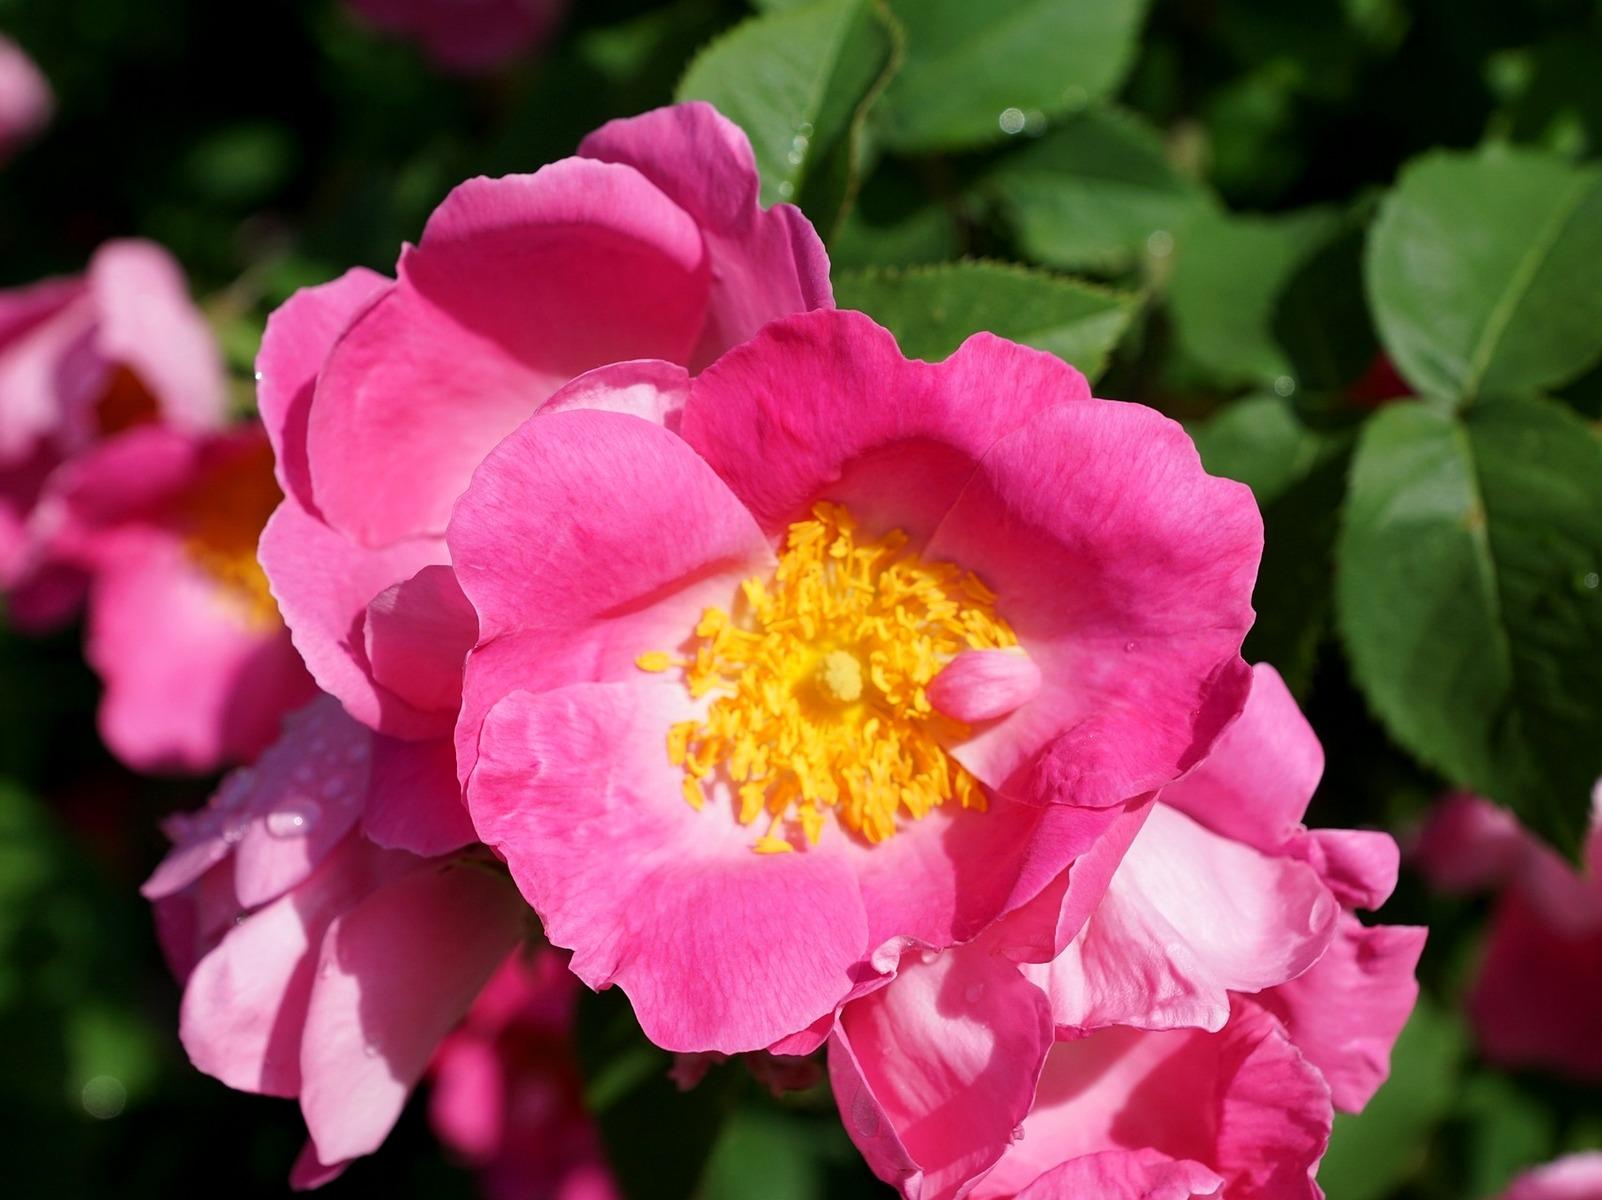 LPEFB wild rose eglantier